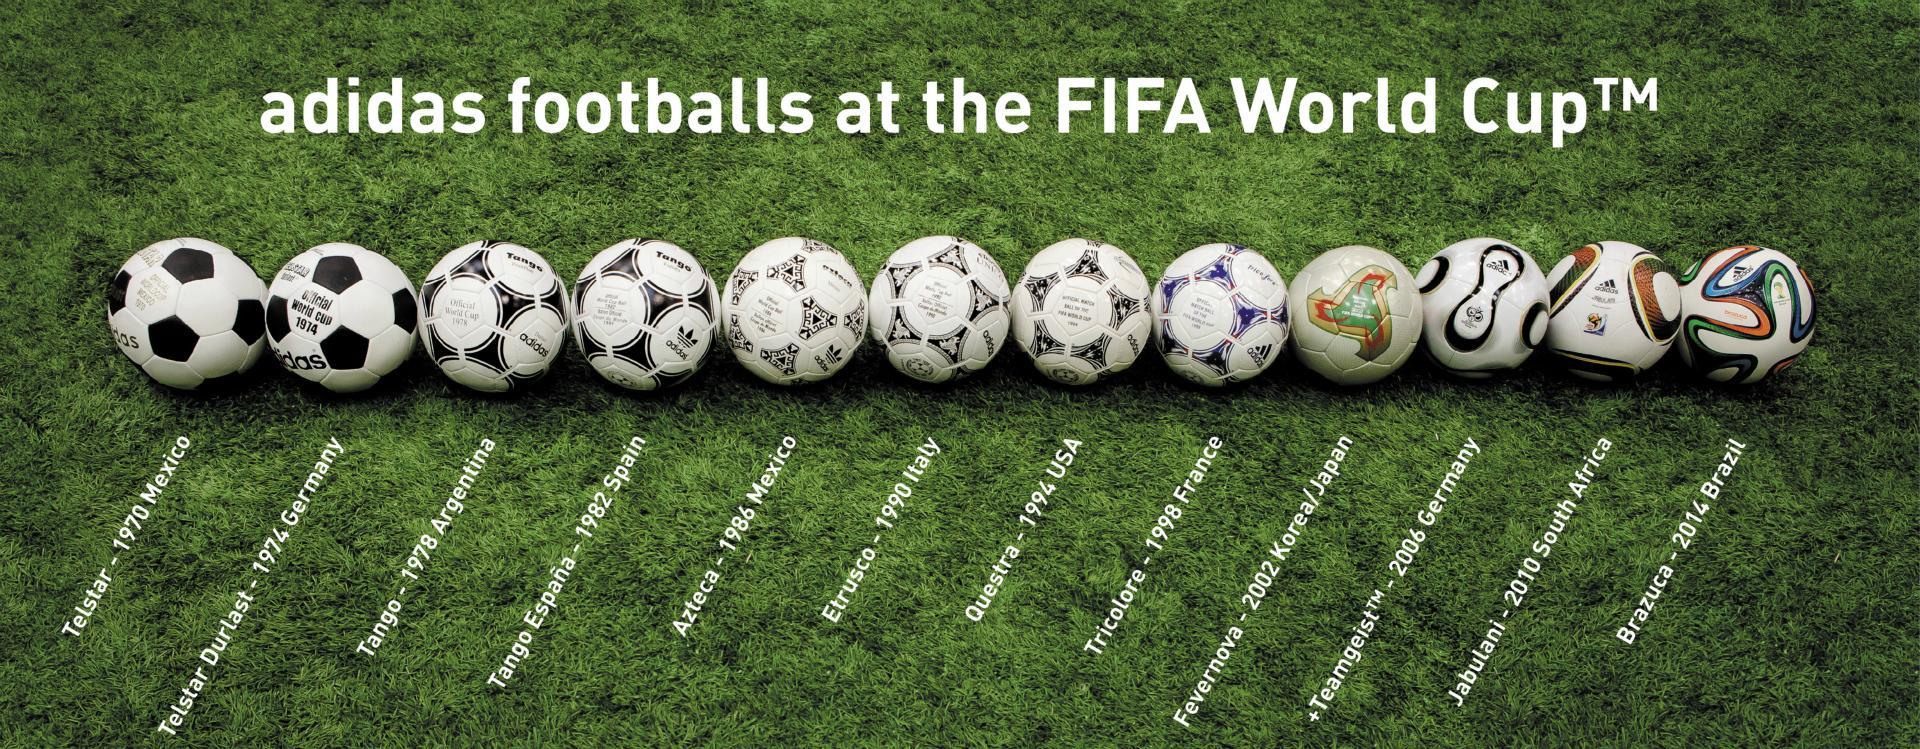 mingi fotbal adidas campionatul mondial